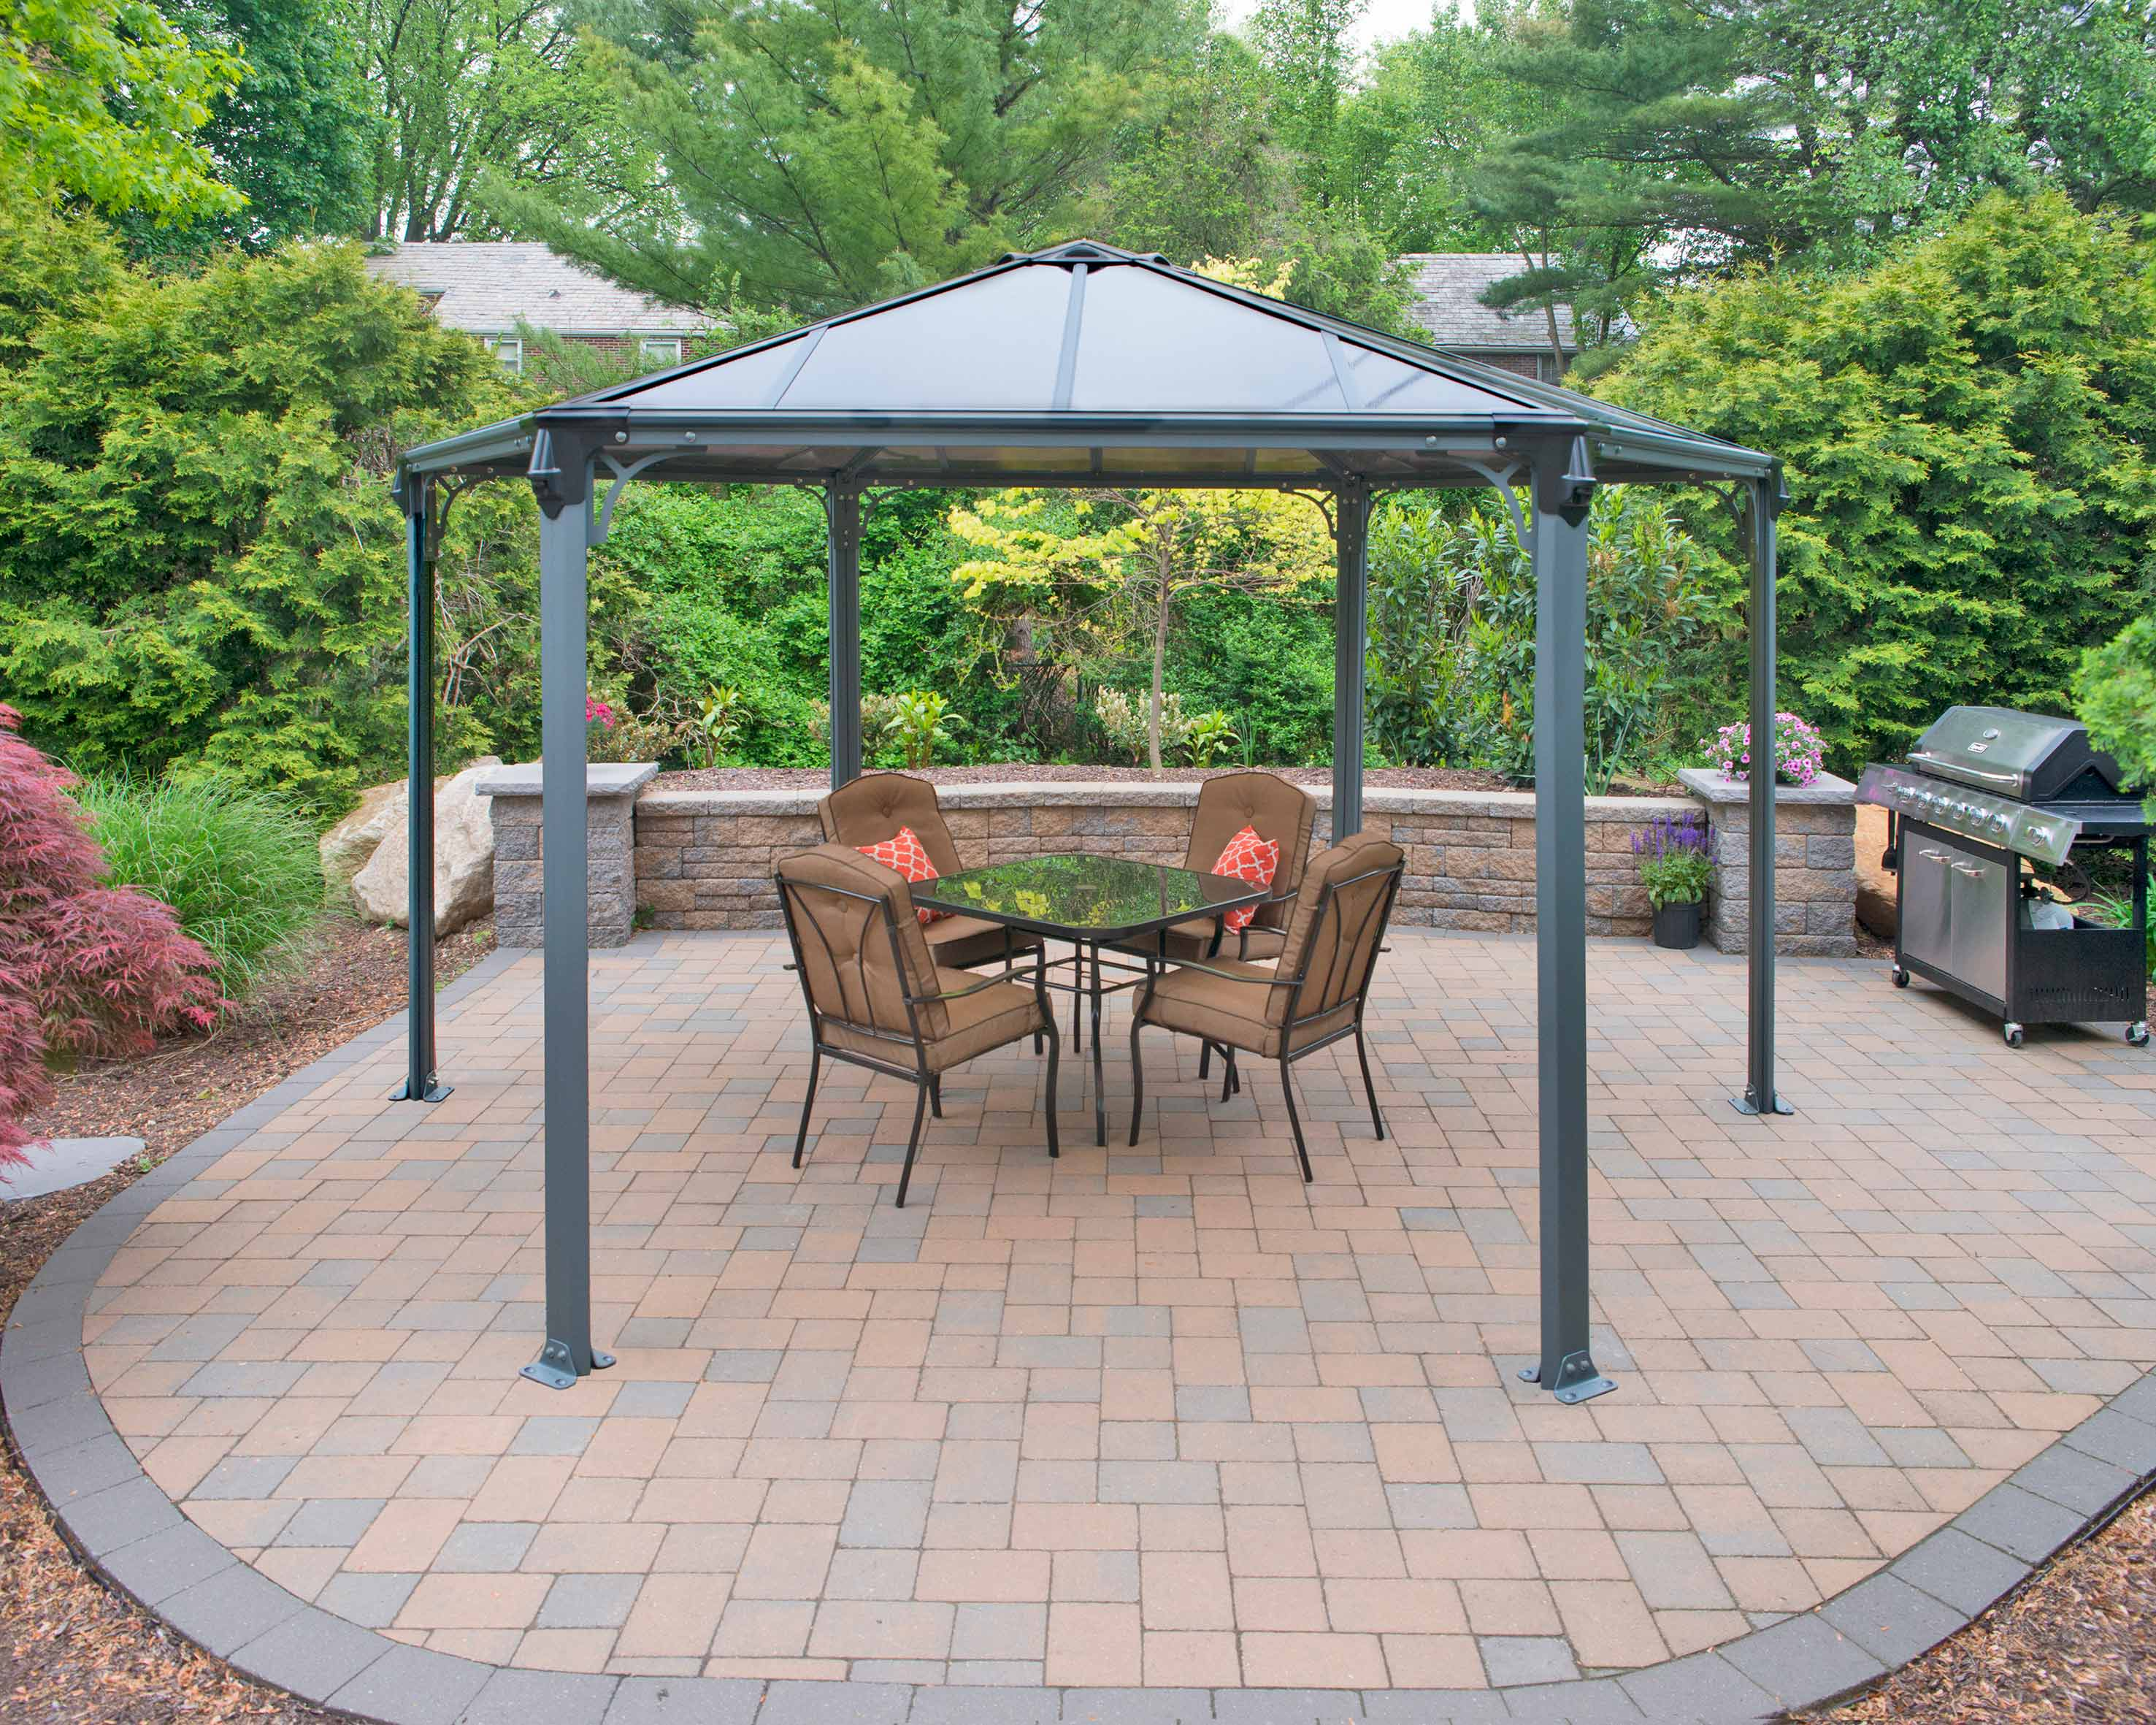 Chatsworth Garden Gazebo – The Canopy Shop